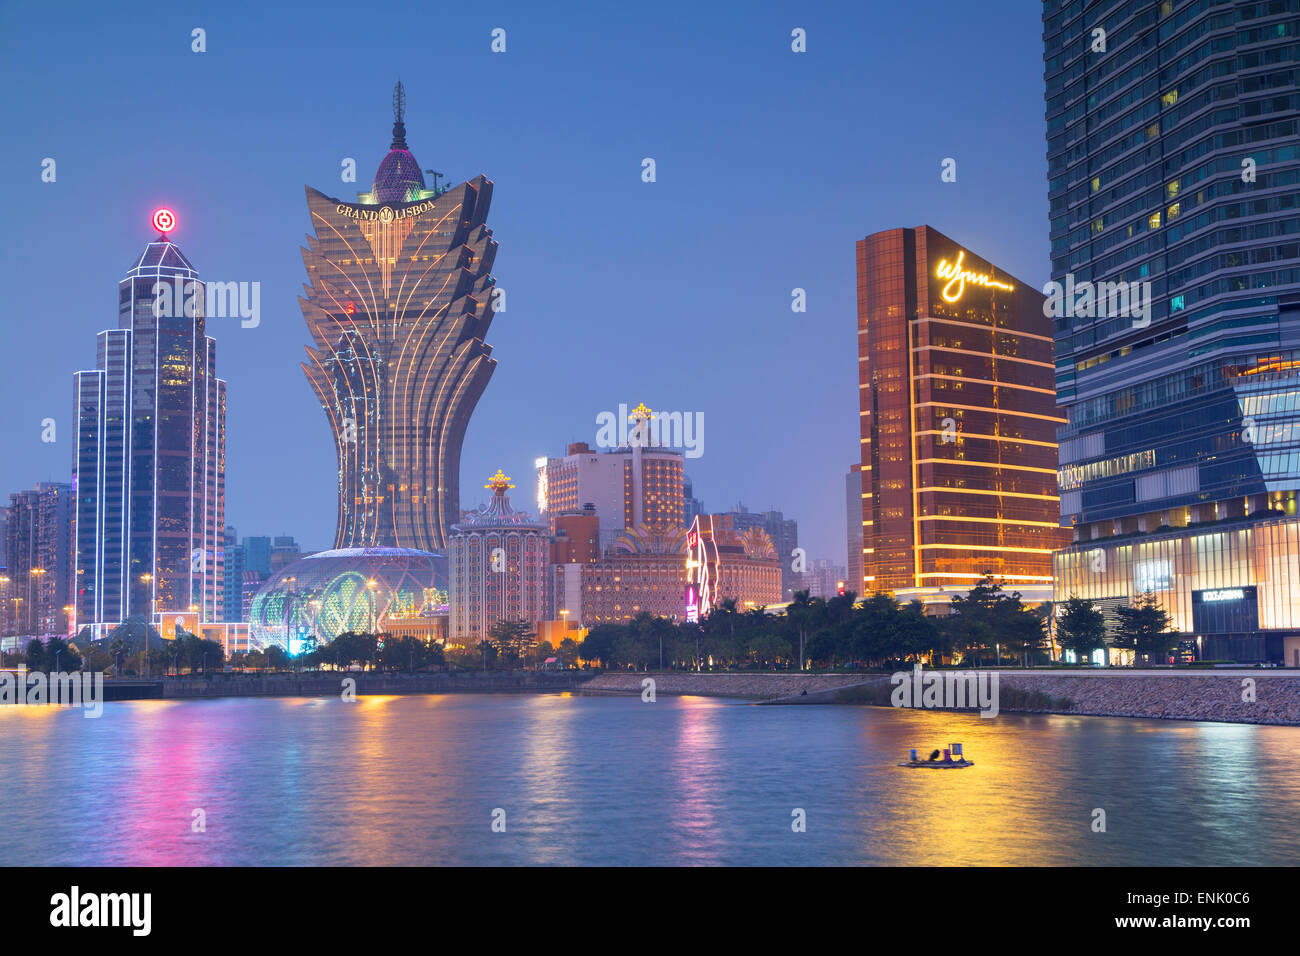 Grand Lisboa e Wynn Hotel and Casino al crepuscolo, Macau, Cina e Asia Immagini Stock